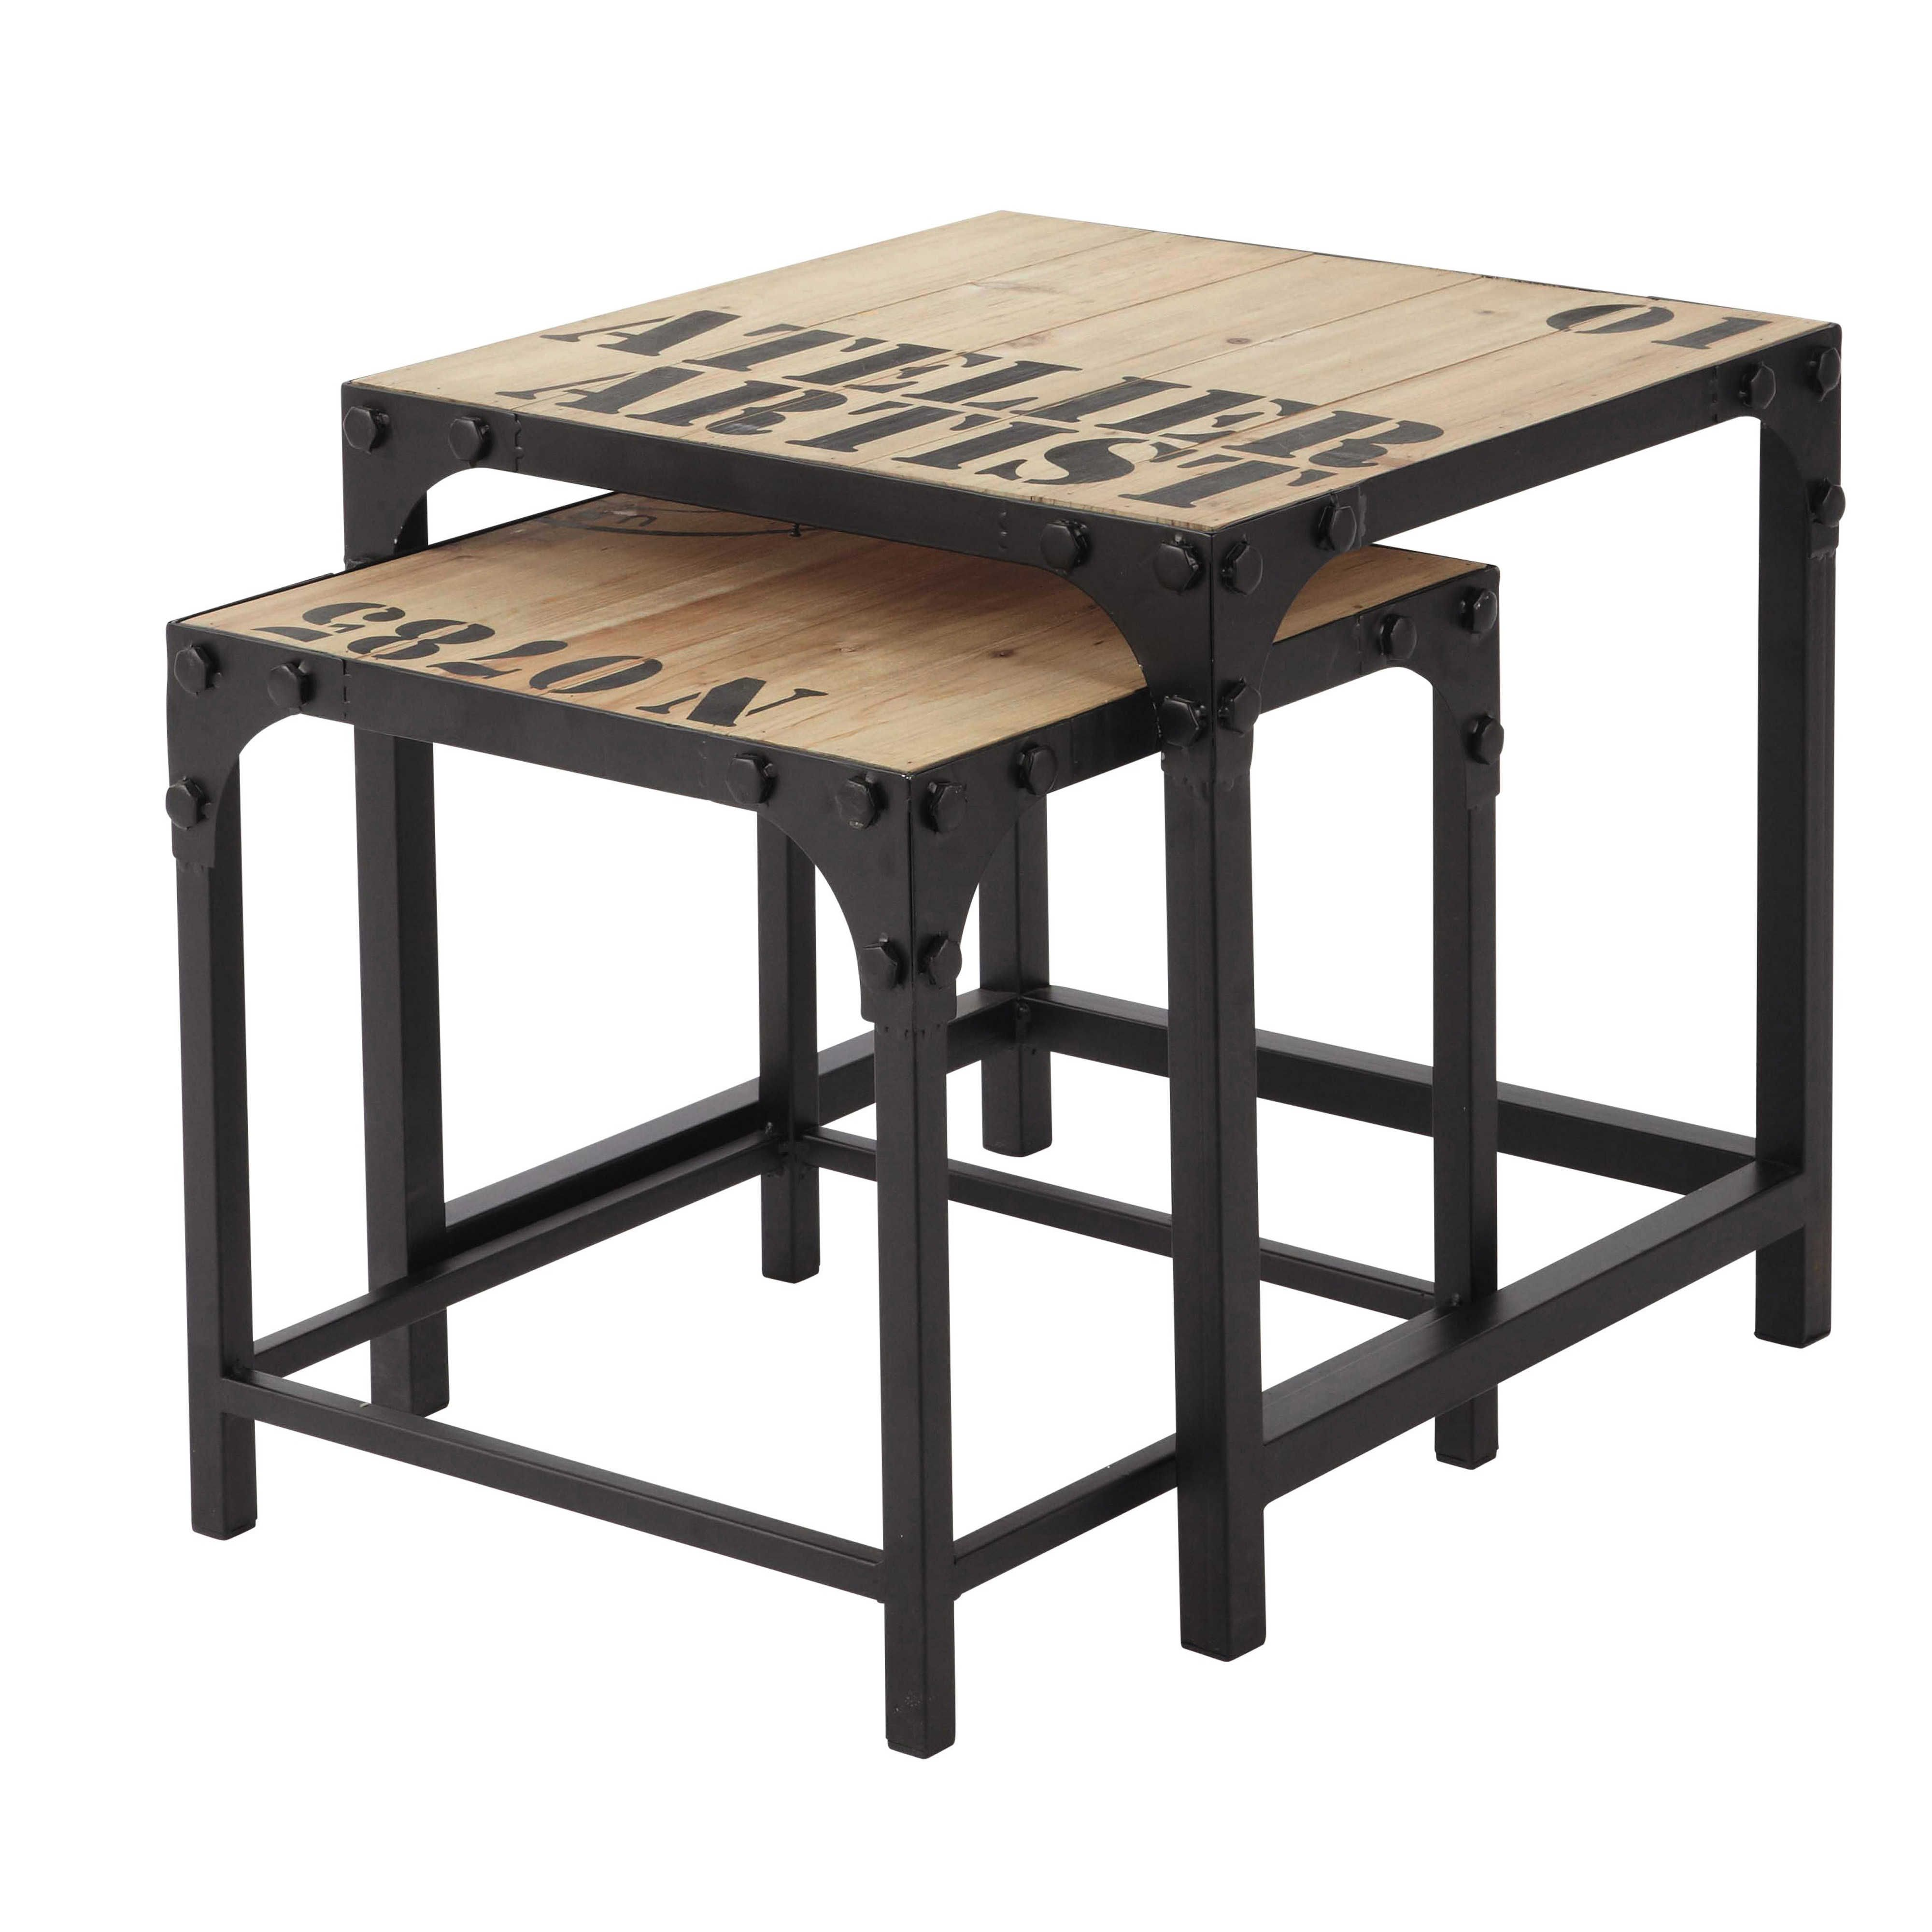 2 Tables Basses Indus En Sapin Et Metal Maisons Du Monde Industrial Coffee Table Coffee Table Metal Coffee Table [ 4000 x 4000 Pixel ]